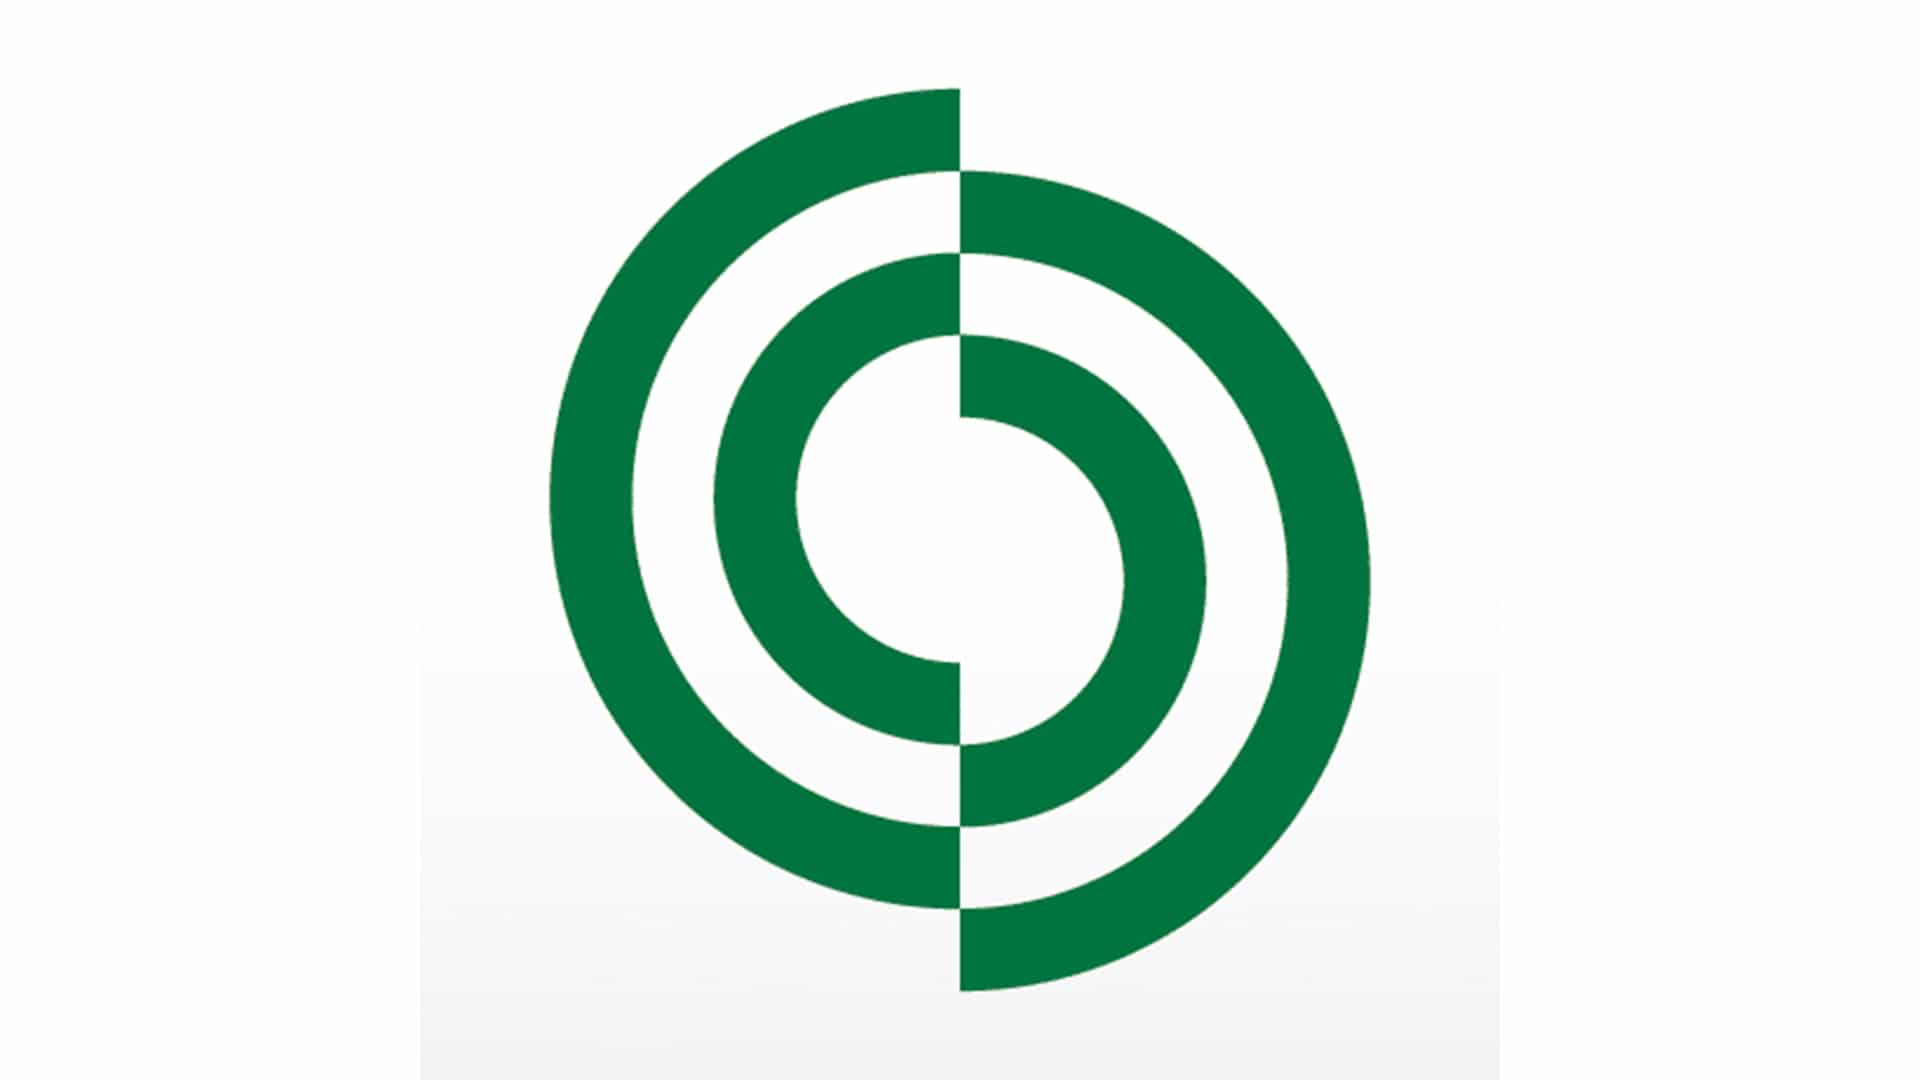 logo-hjerneskade